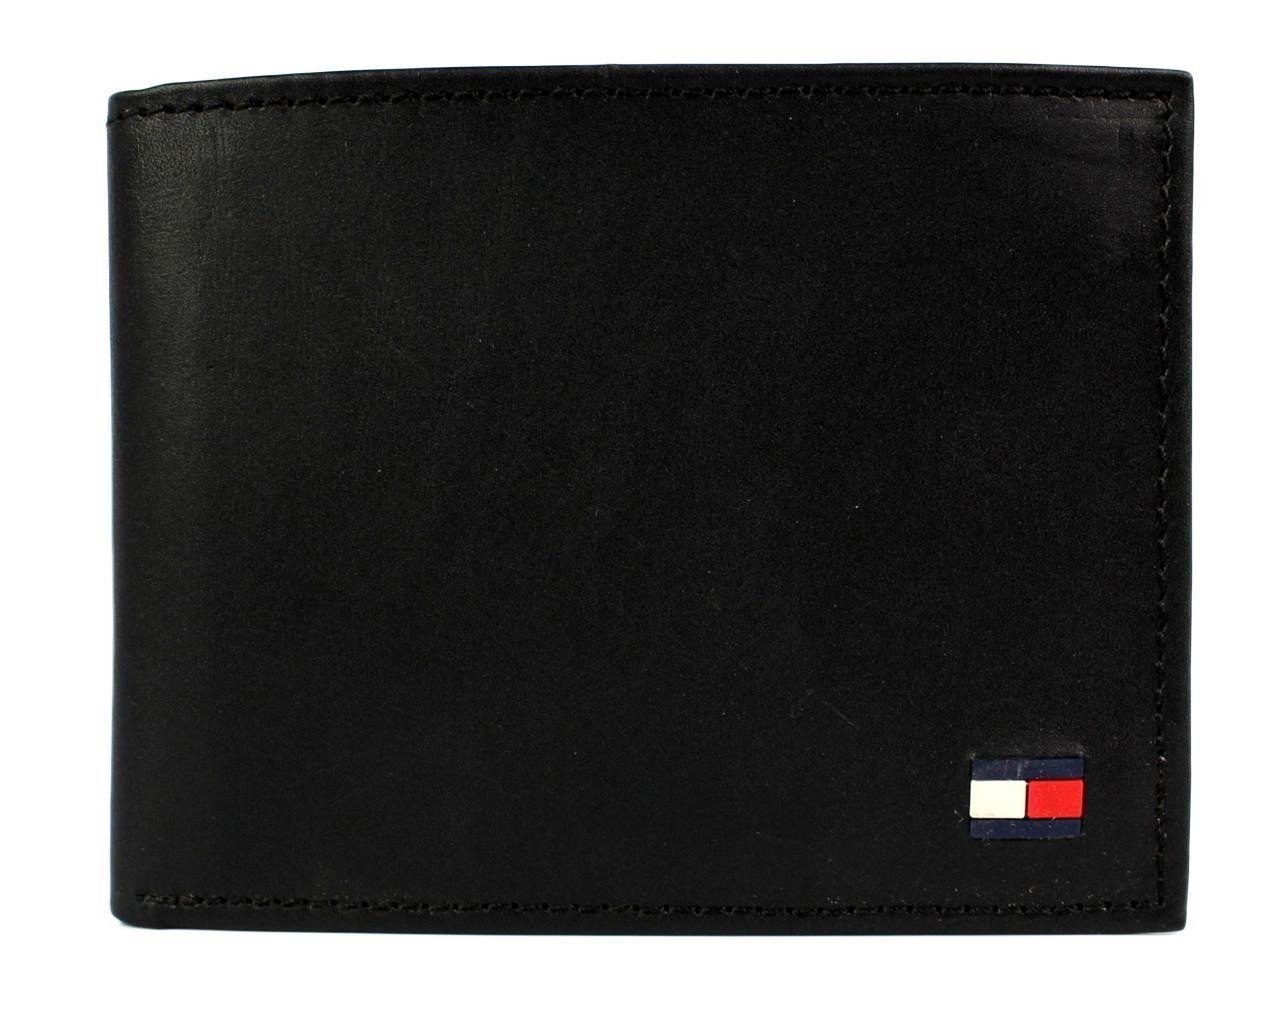 Tommy-Hilfiger-Men-039-s-Premium-Leather-Credit-Card-ID-Wallet-Passcase-31TL22X046 thumbnail 8